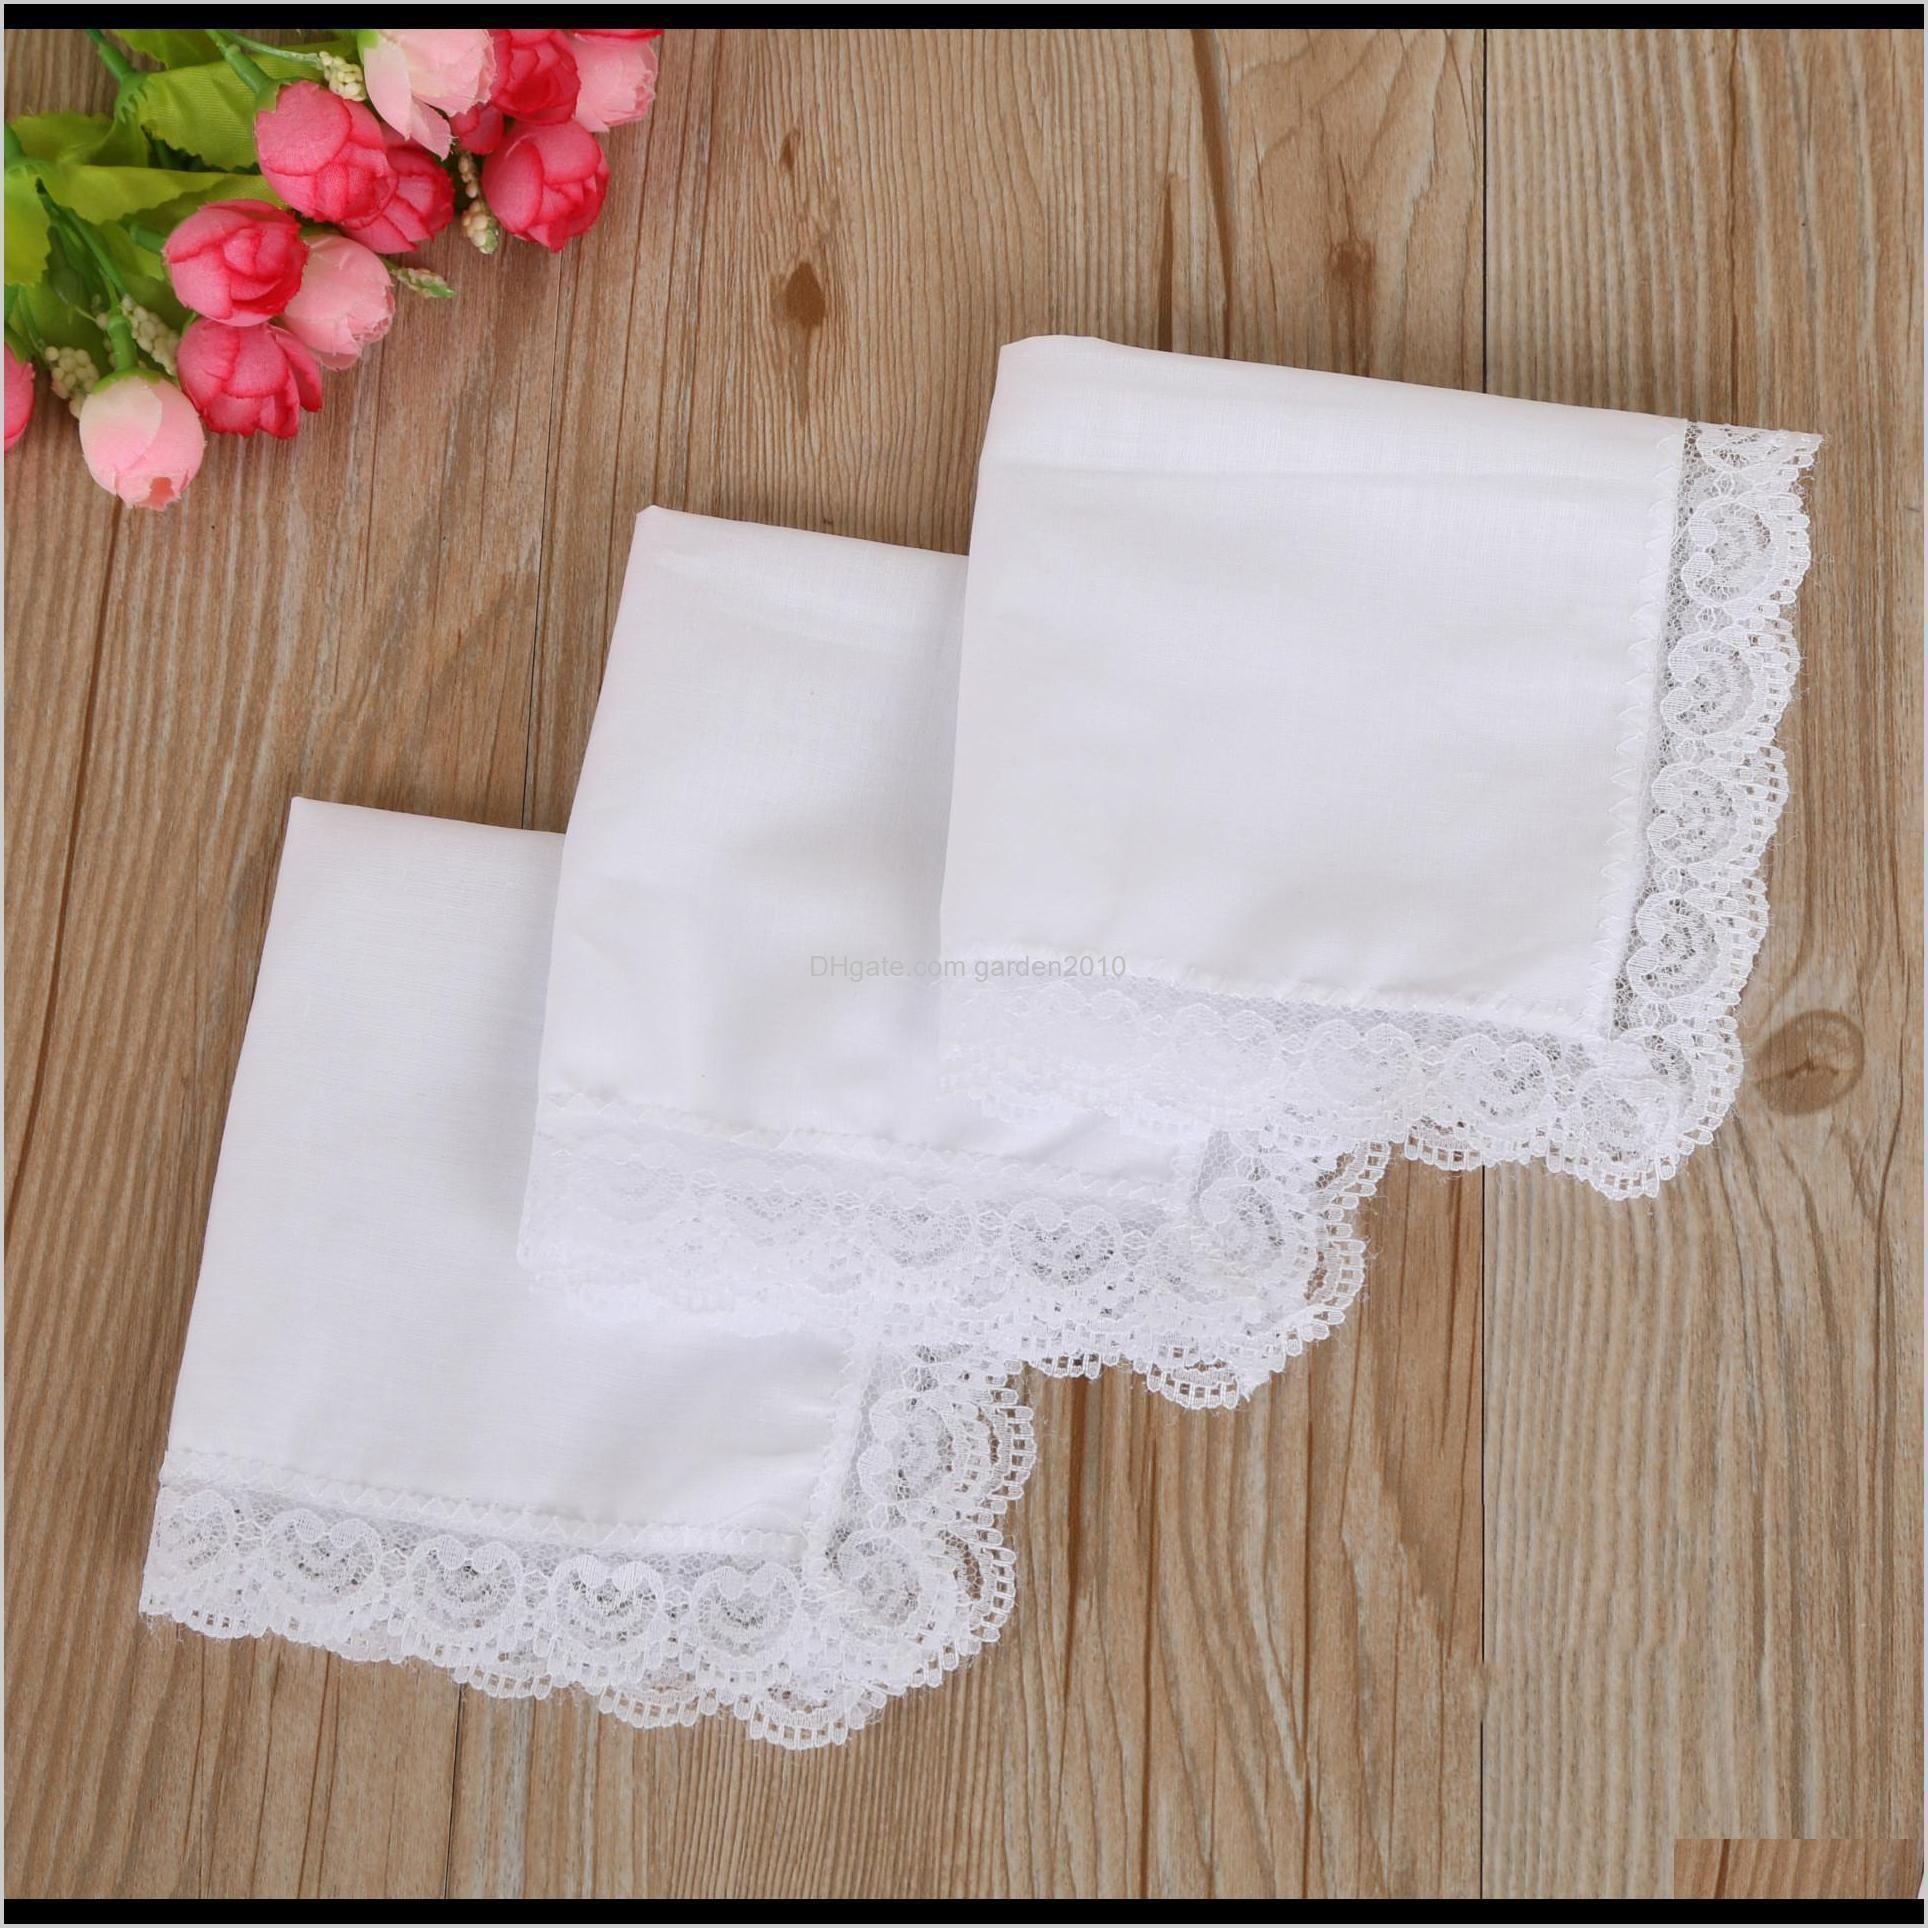 White Lace Thin Woman Wedding Gifts Party Decoration Cloth Napkins Plain Blank Diy Handkerchief Hha2096 Imsuz Bmpxc